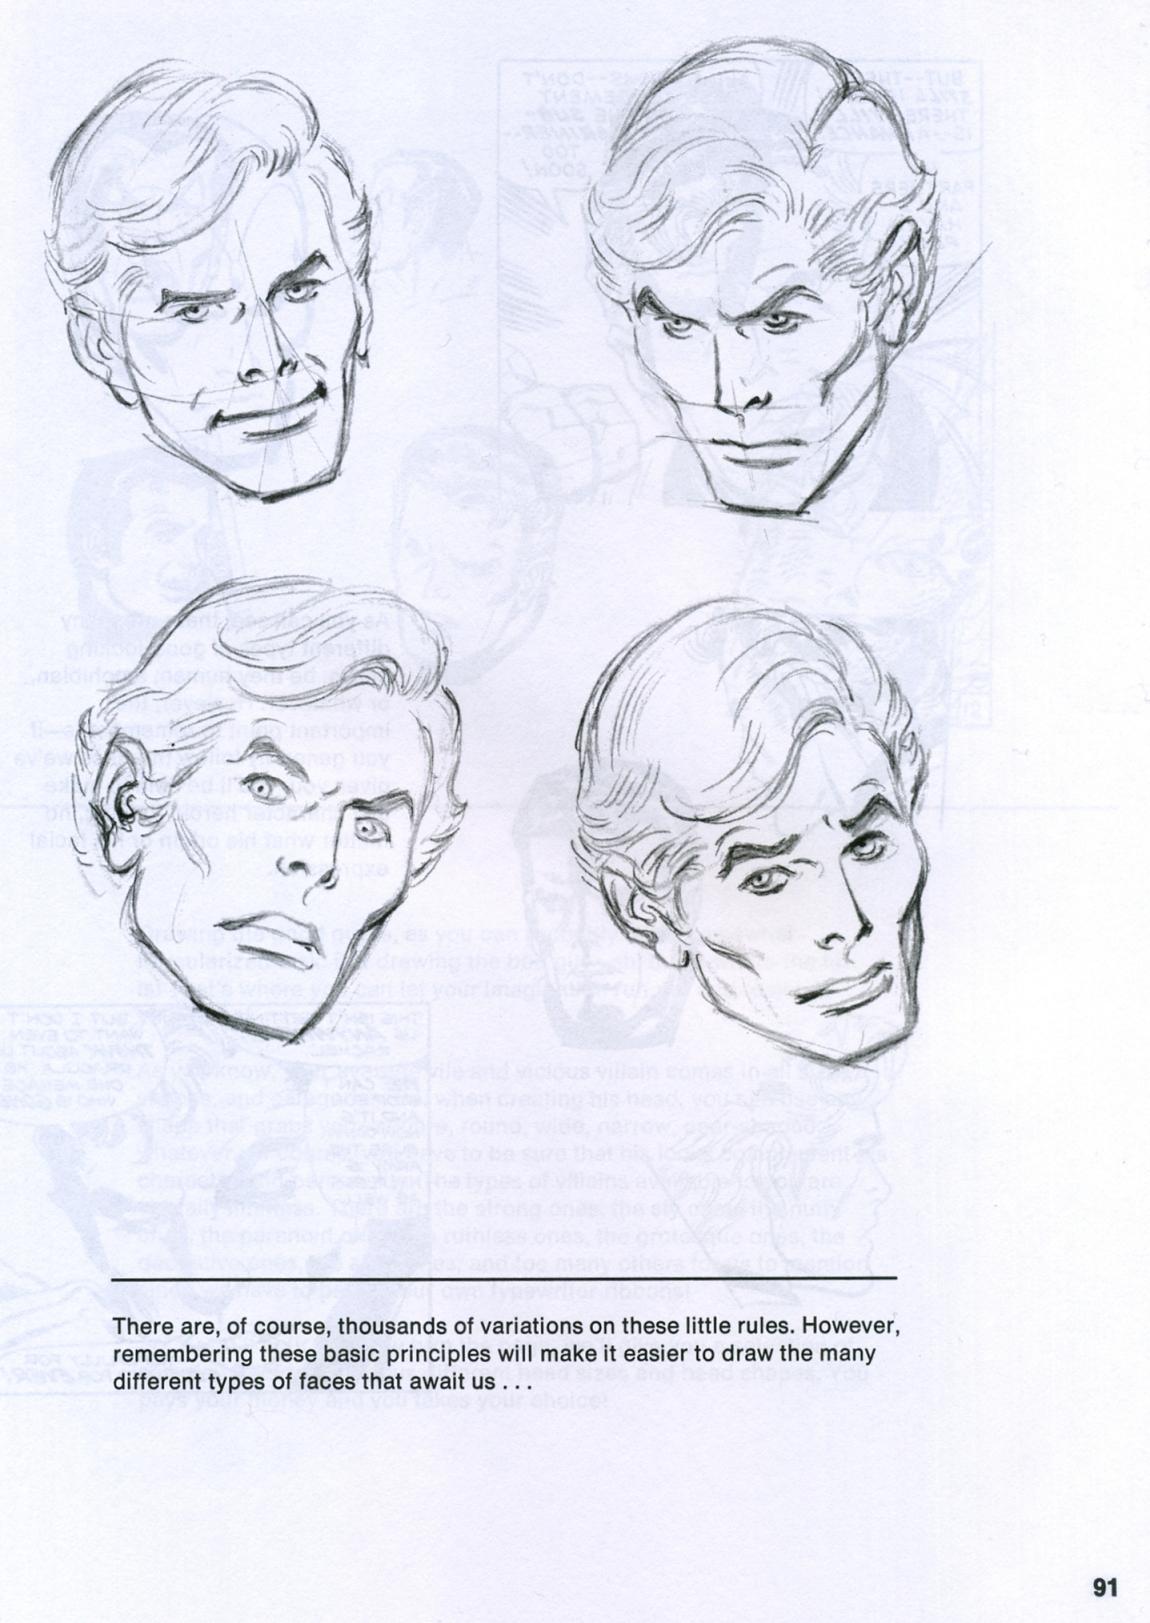 1150x1623 The Human Head According To John Buscema! Mars Will Send No More